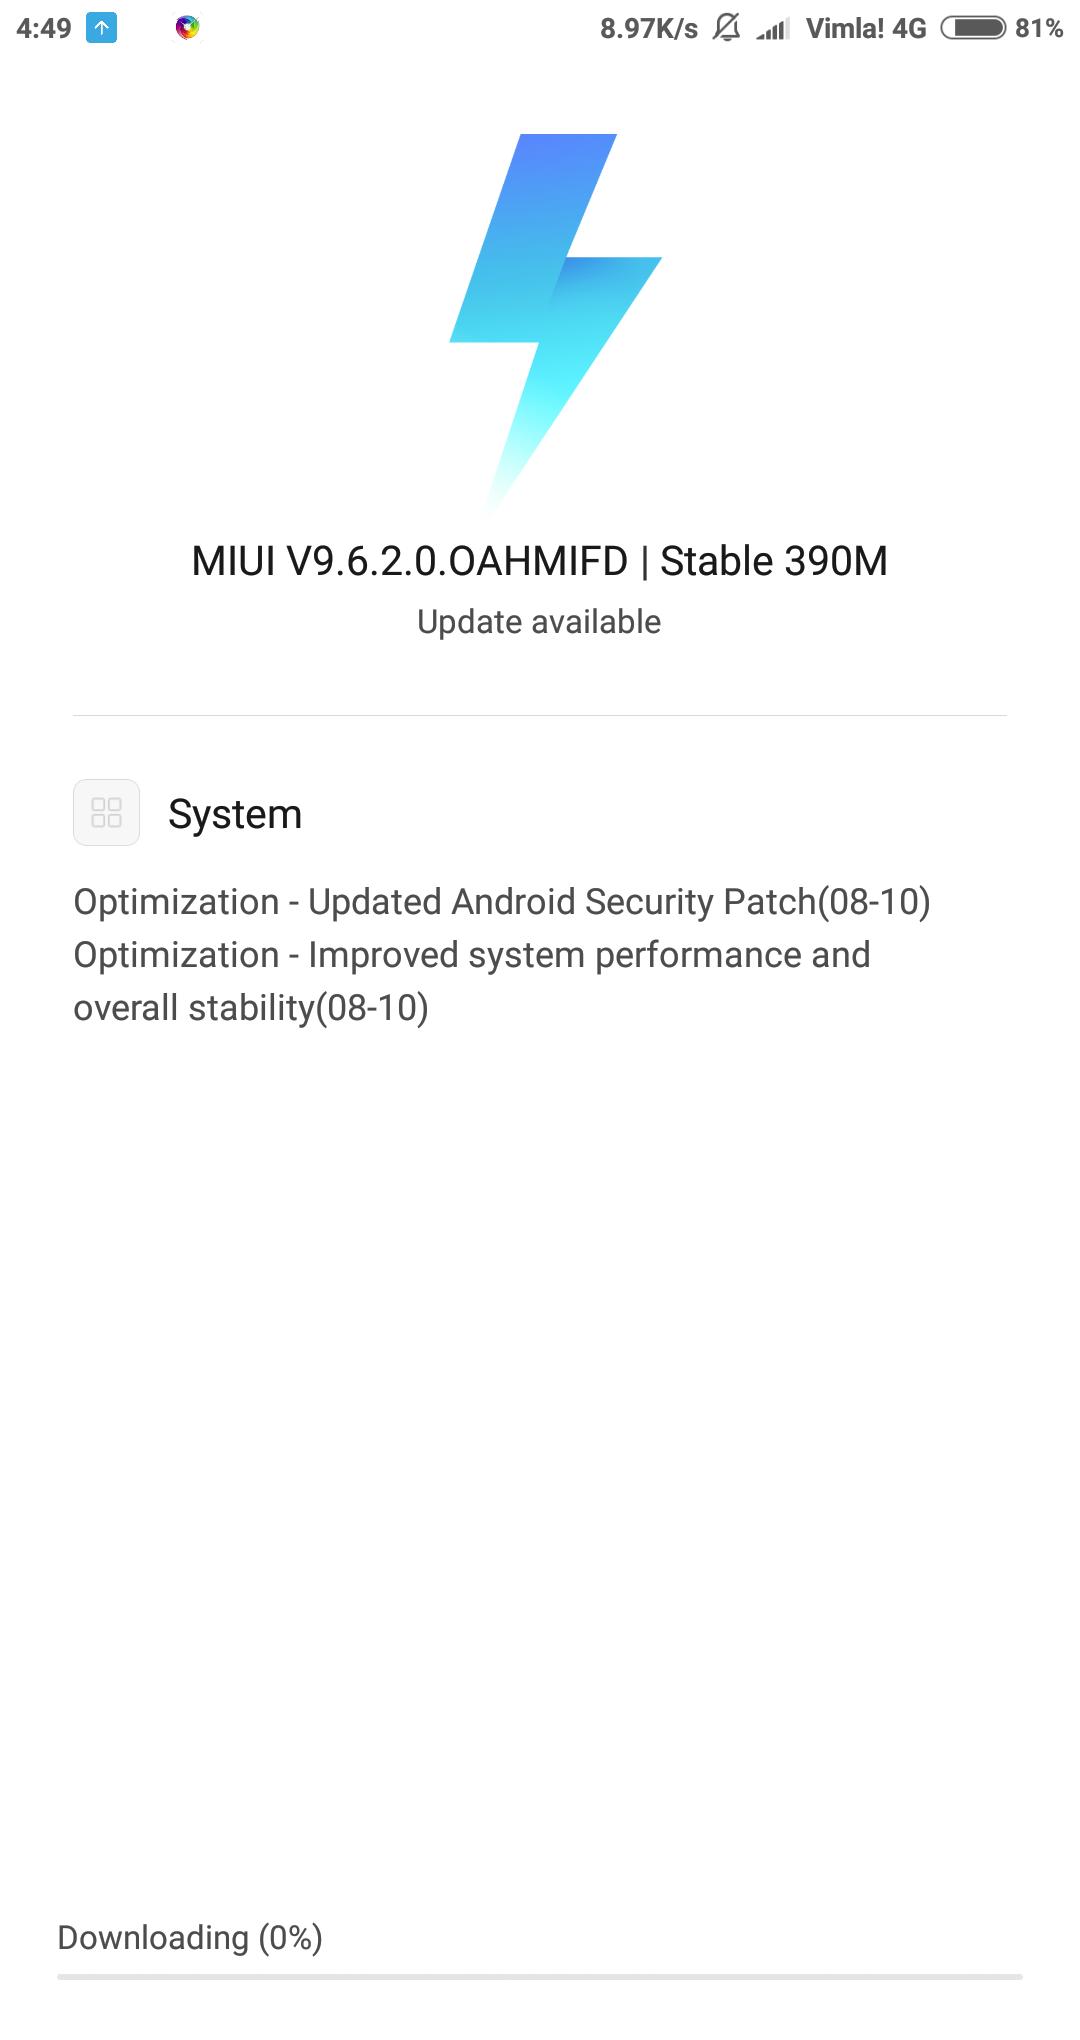 Screenshot_2018-08-17-04-49-19-734_com.android.updater.png